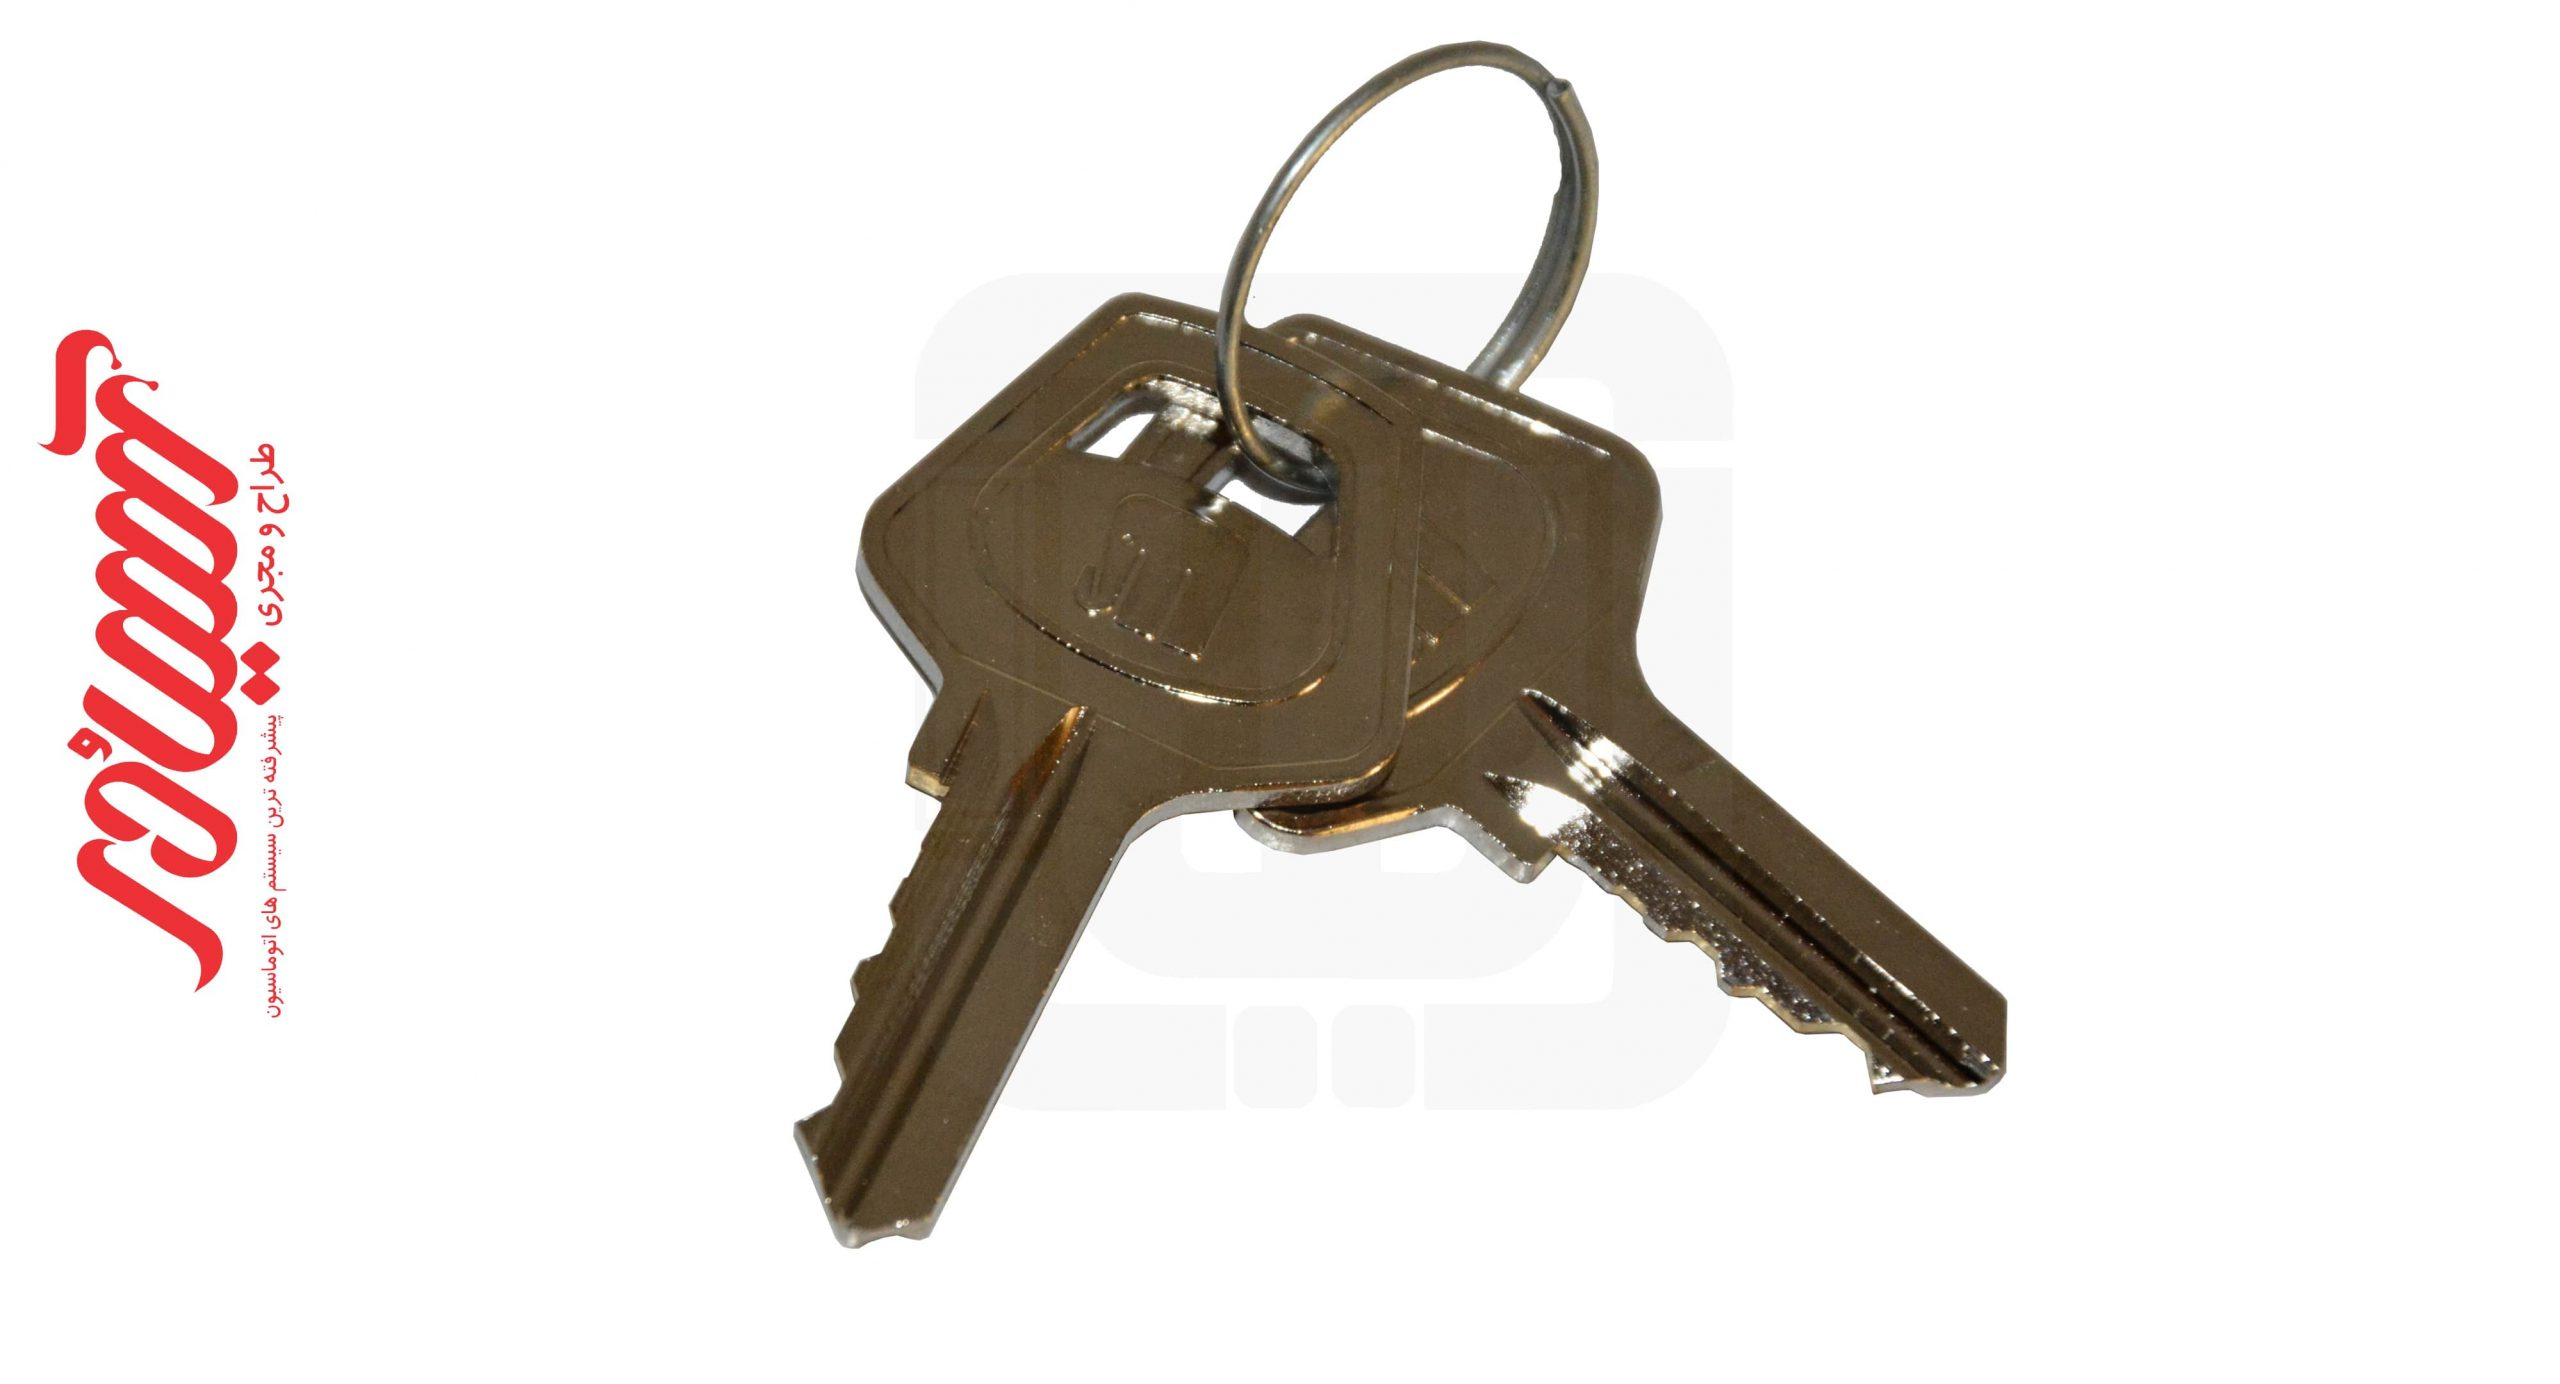 کلید خلاص کن جک نایس وینگو A60